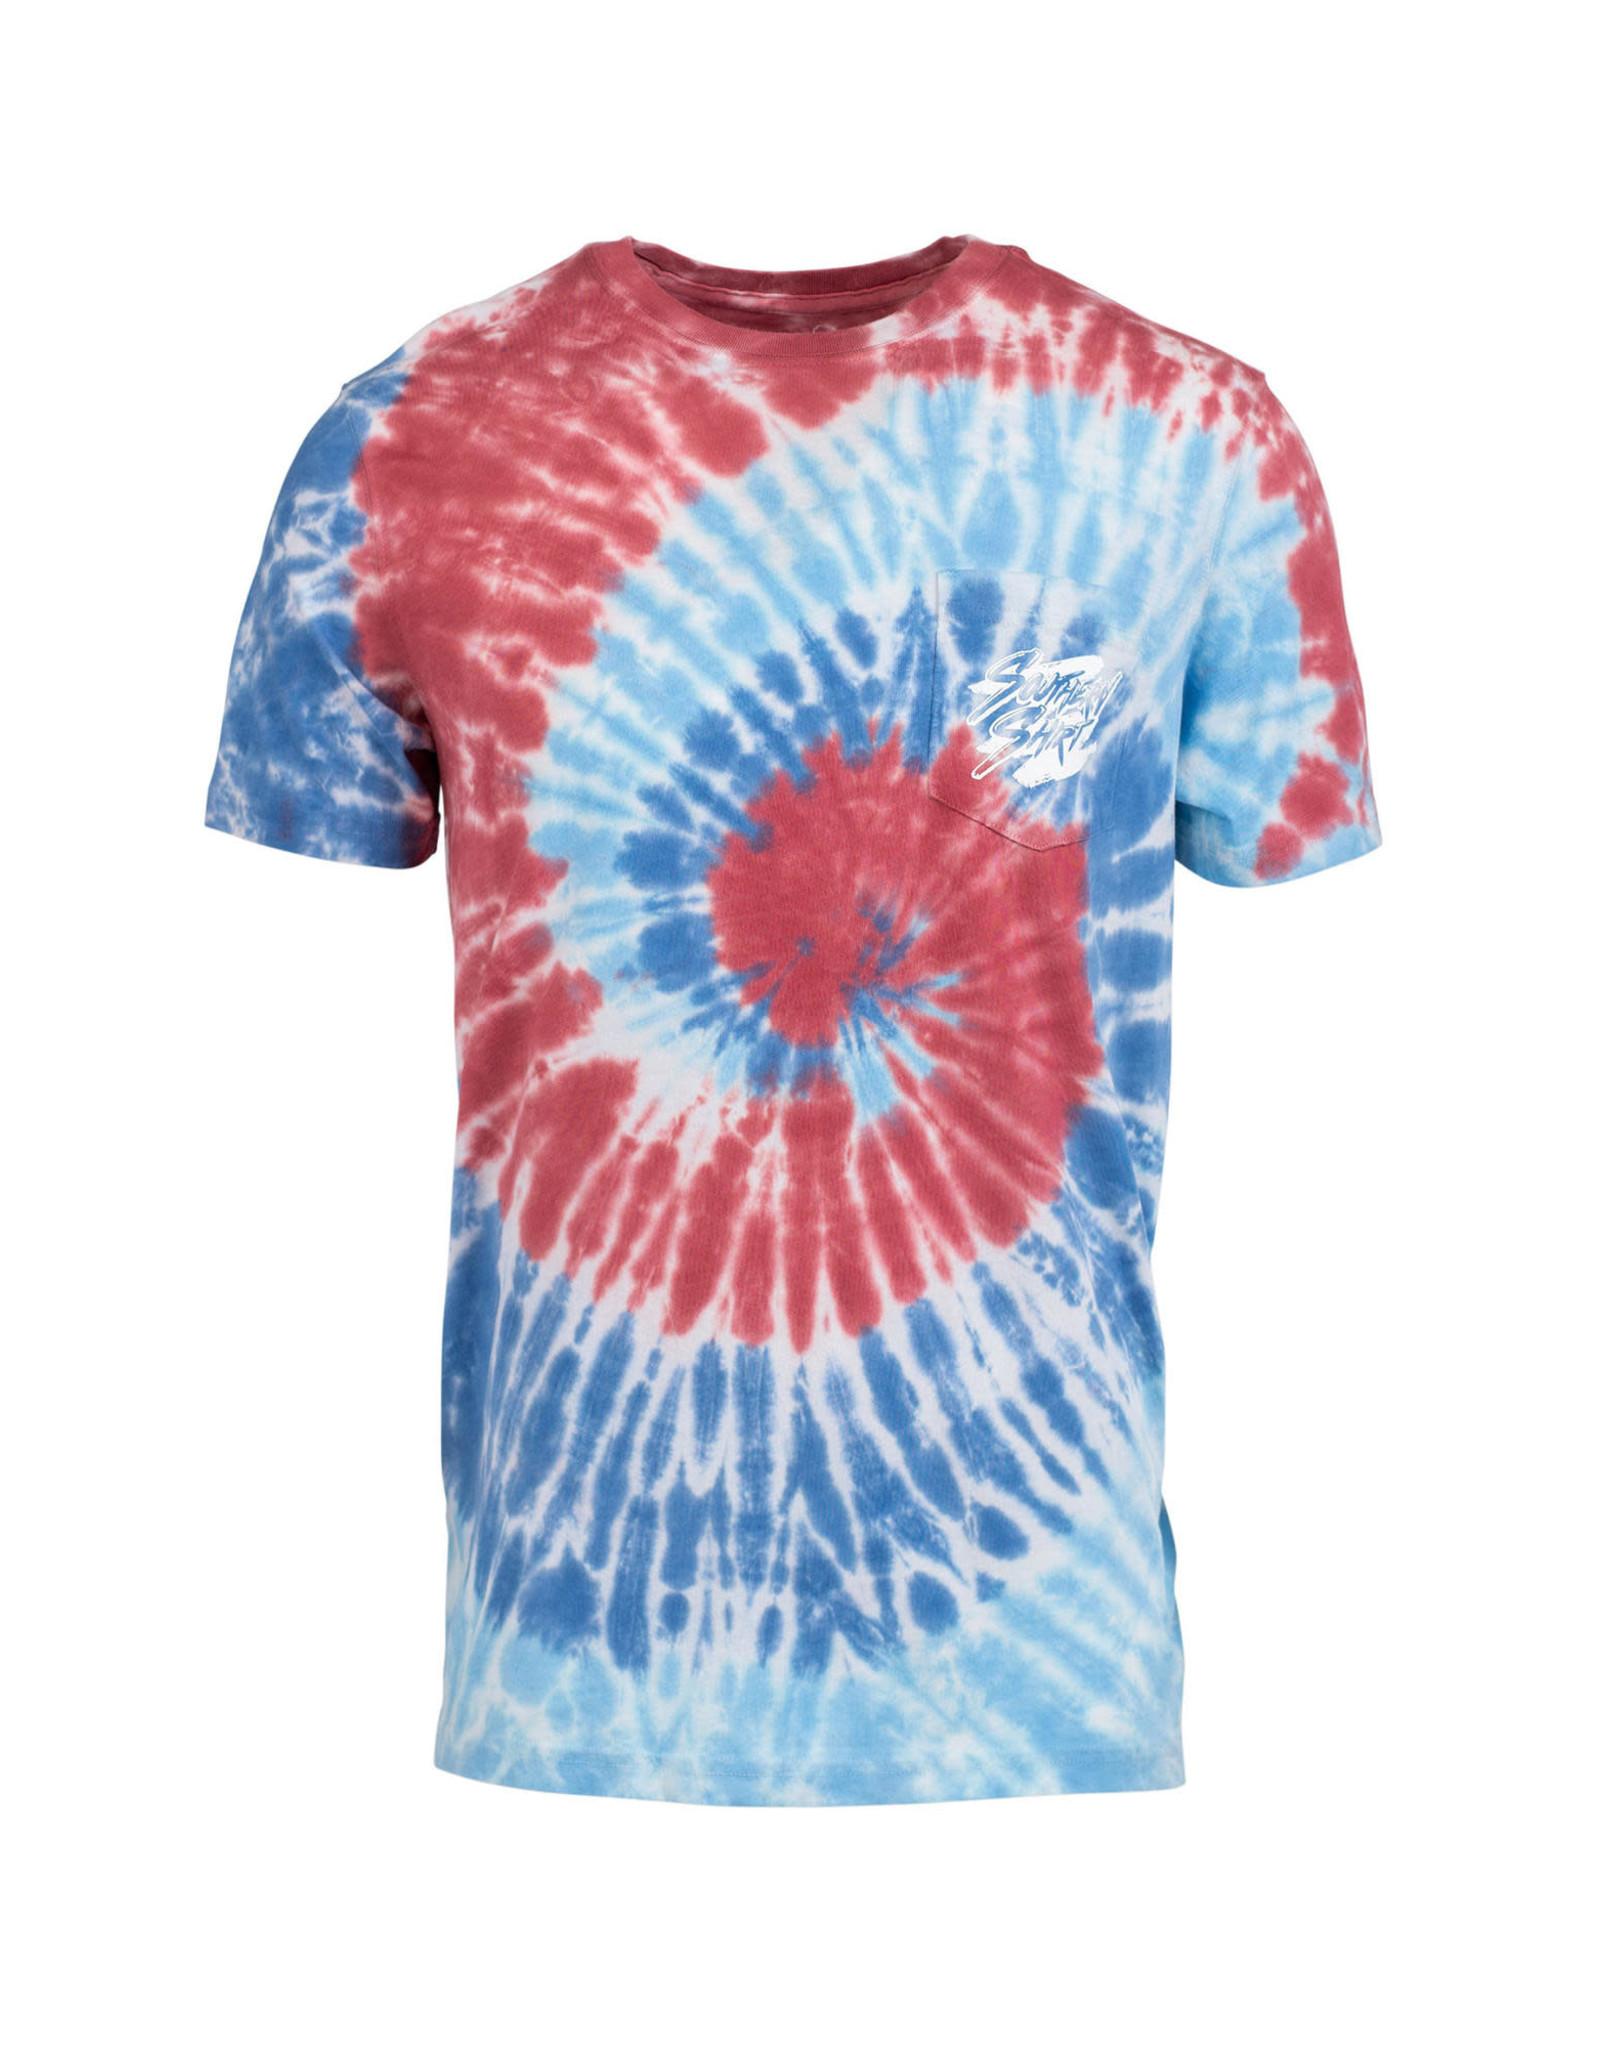 Southern Shirt Co 1T089 - Bae Watch USA SS Tee